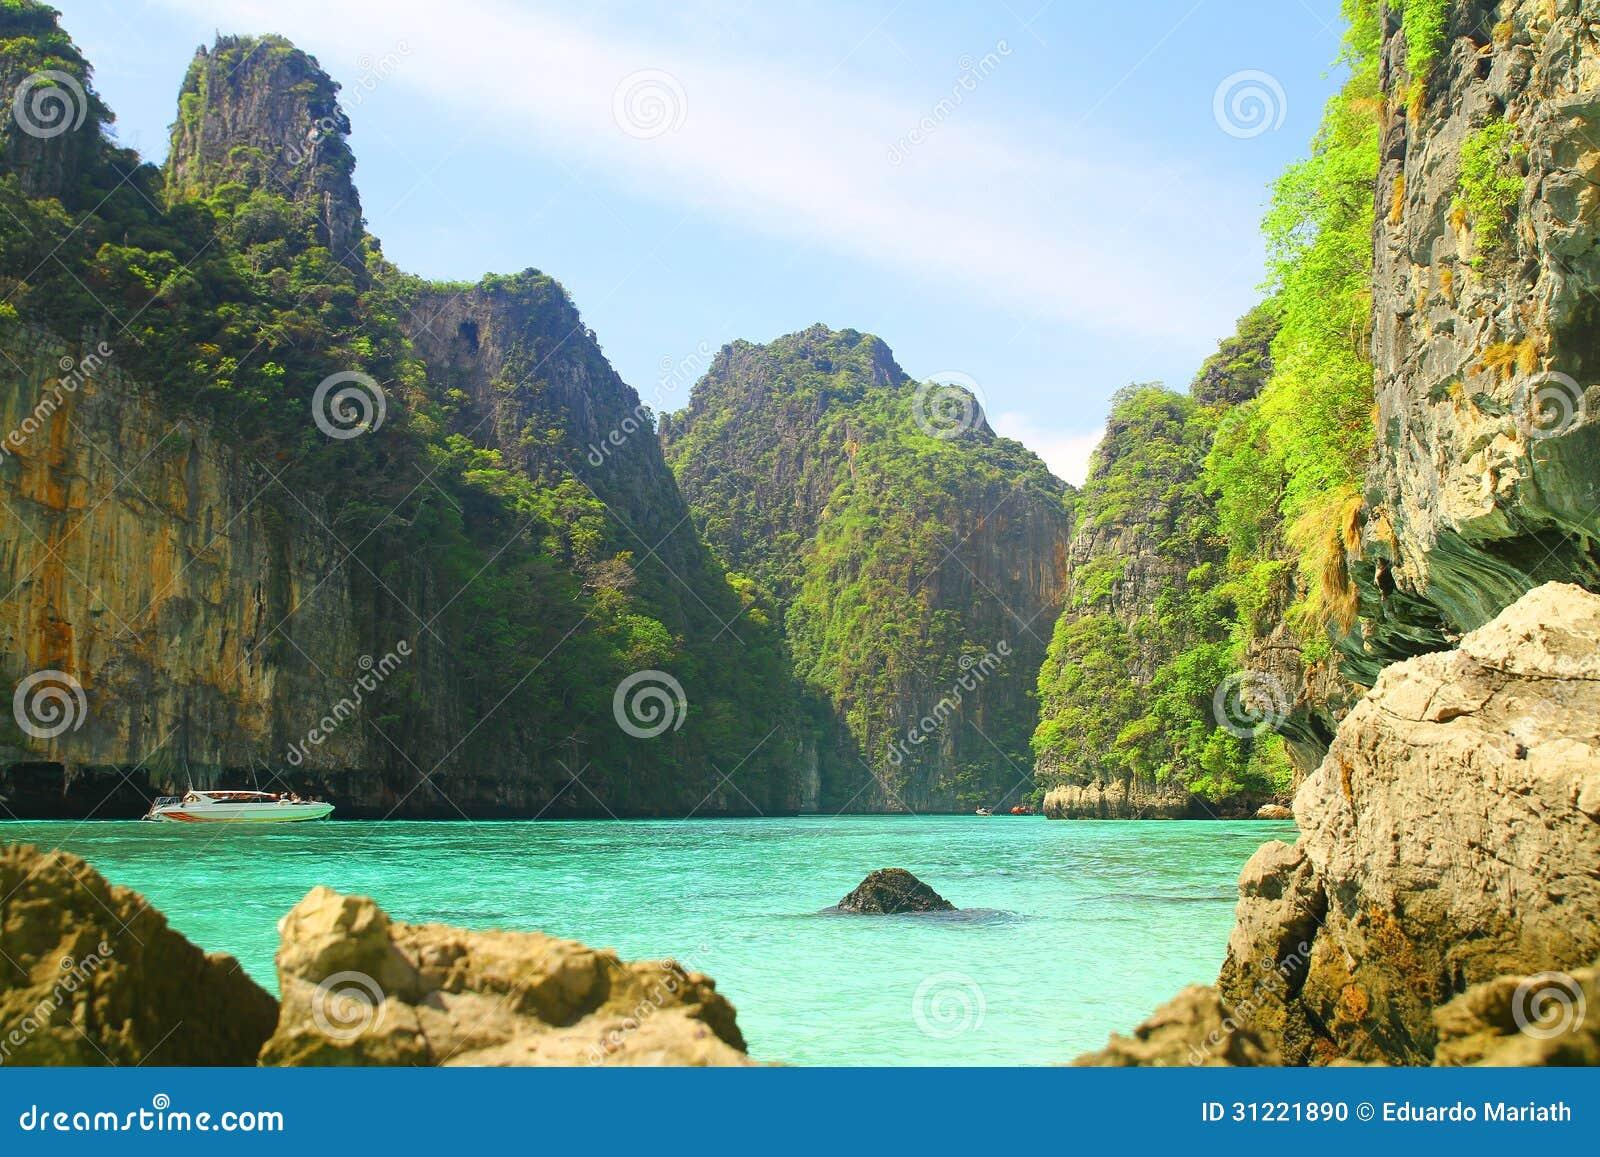 Pileh Bay On Koh Phi Phi Le Island - Thailand Stock Photo - Image: 31221890